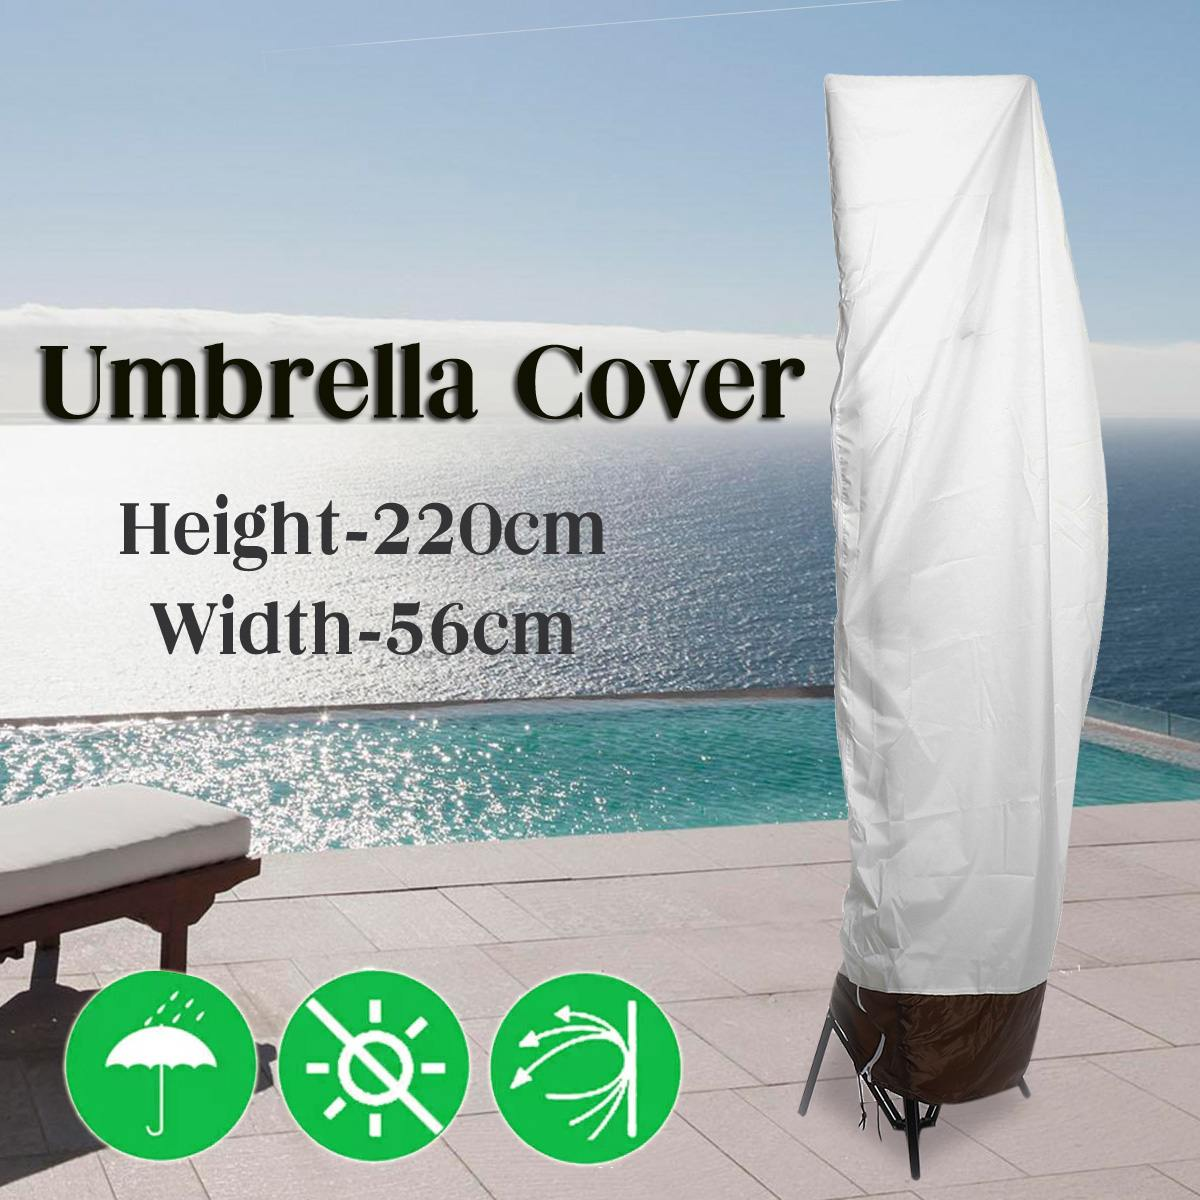 Garden Parasol Cantilever Umbrella Covers Patio Waterproof Outdoor Shield Cover